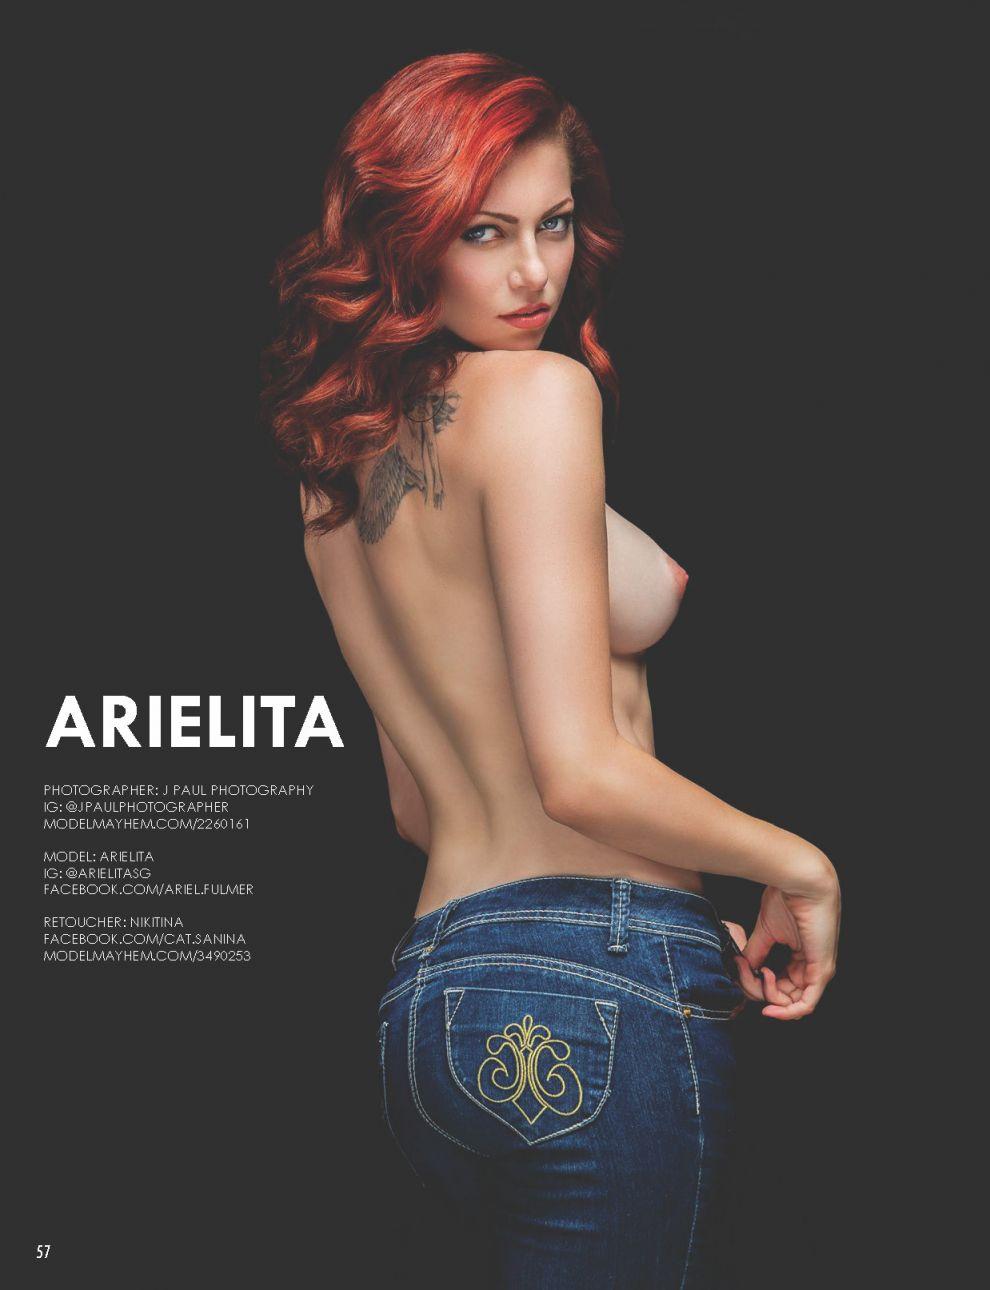 Arielita Sexy Nude Photoshoot (2)